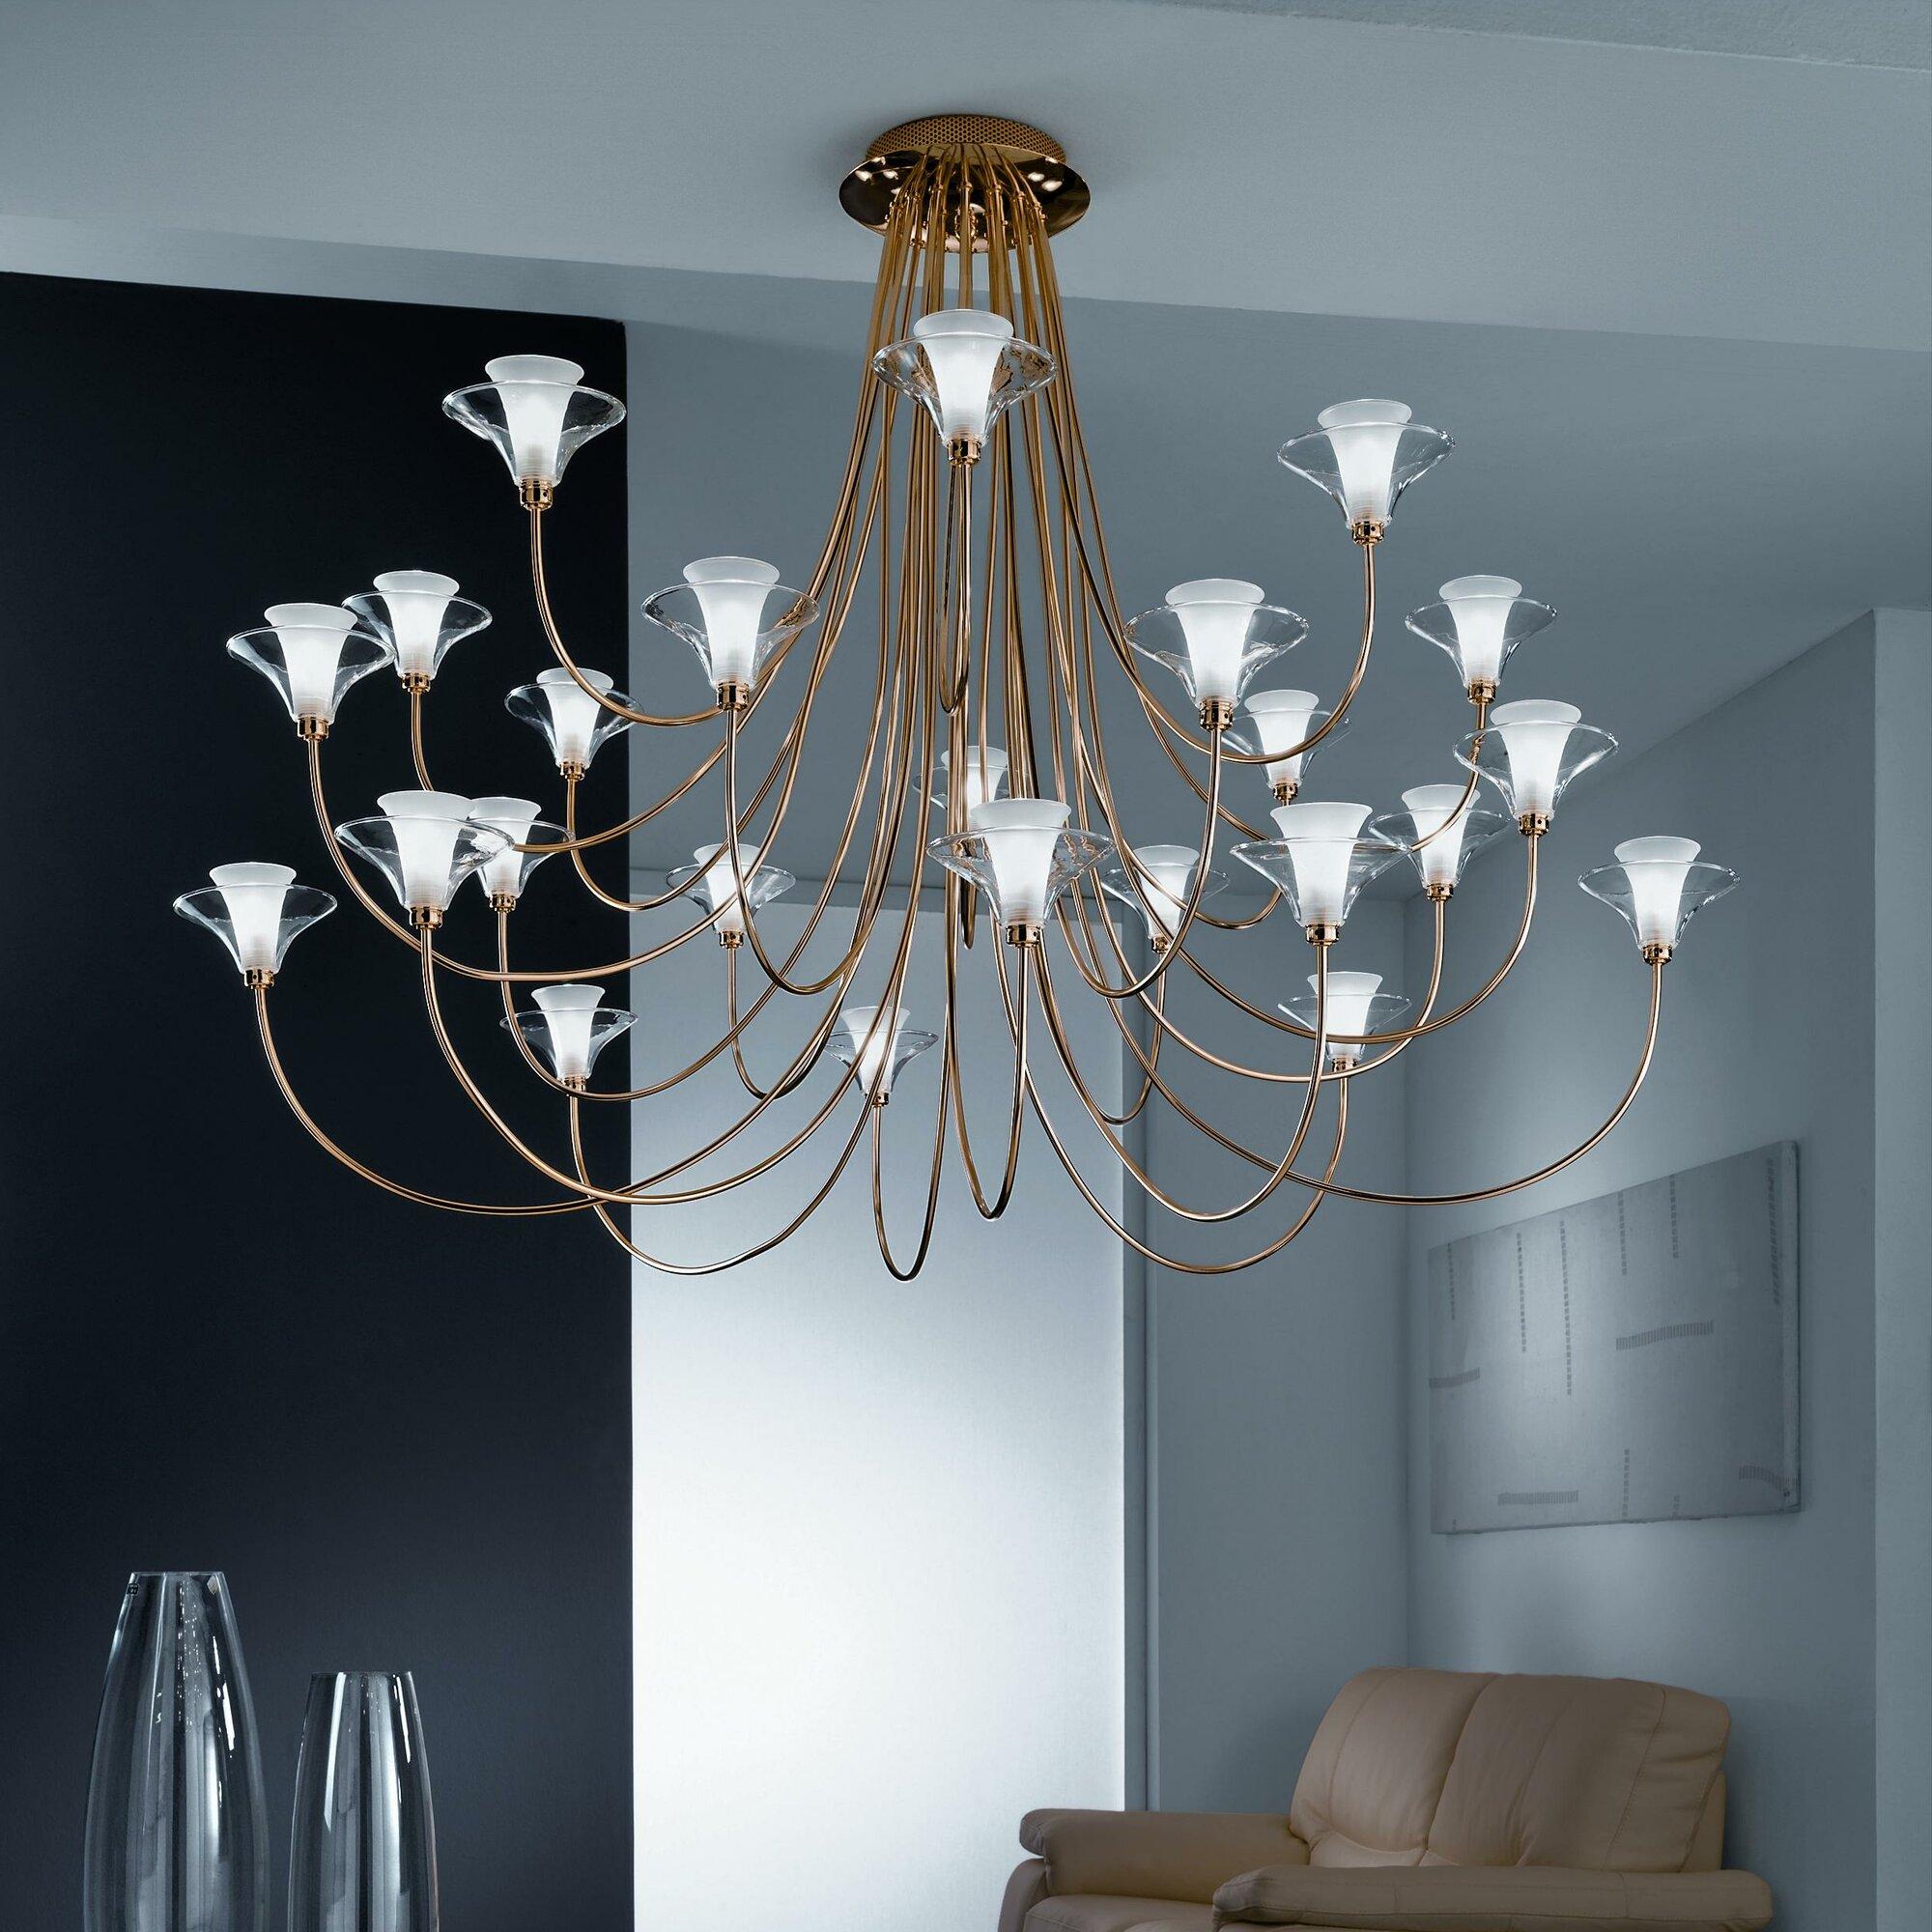 Metal Lux Free Spirit 24 Light Chandelier eBay